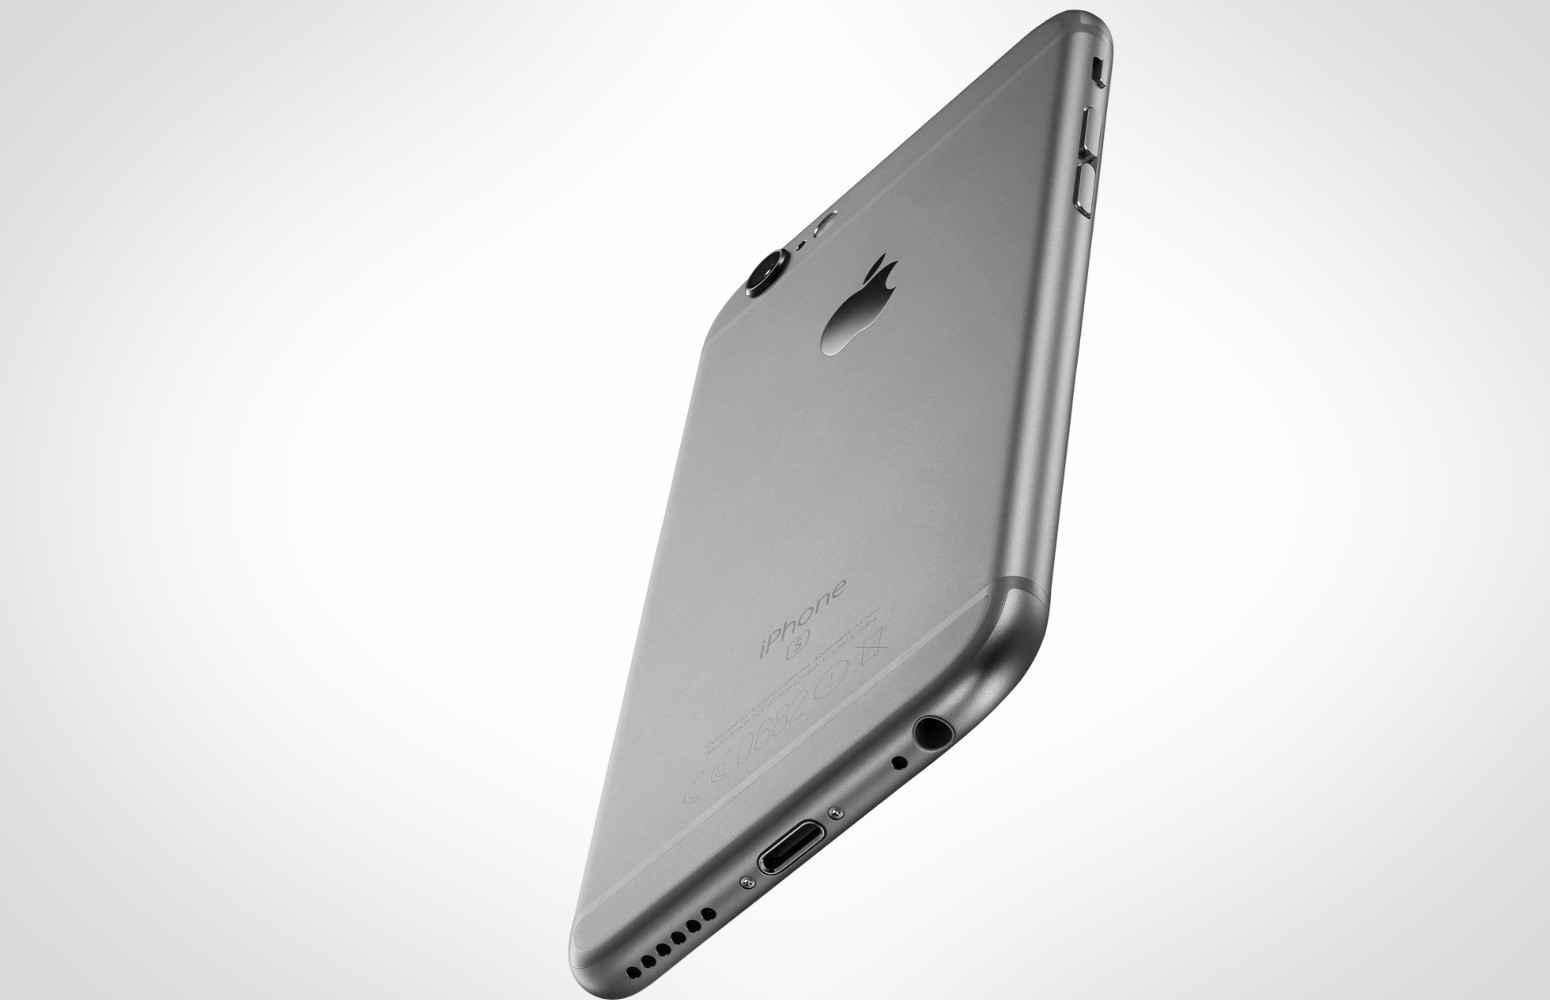 iphone 7 apple watch couteurs sans fil ce qu 39 apple va pr senter mercredi. Black Bedroom Furniture Sets. Home Design Ideas